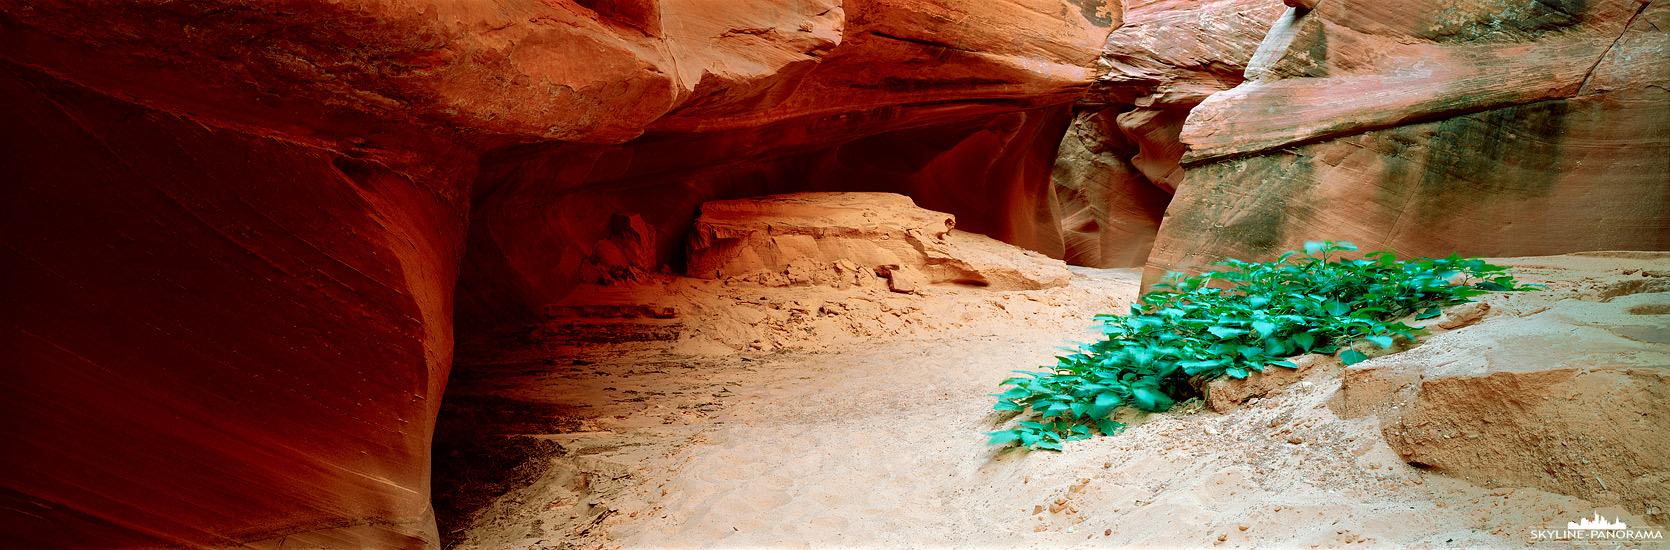 Fotografentour von Waterhole Canyon Experience (p_01196)